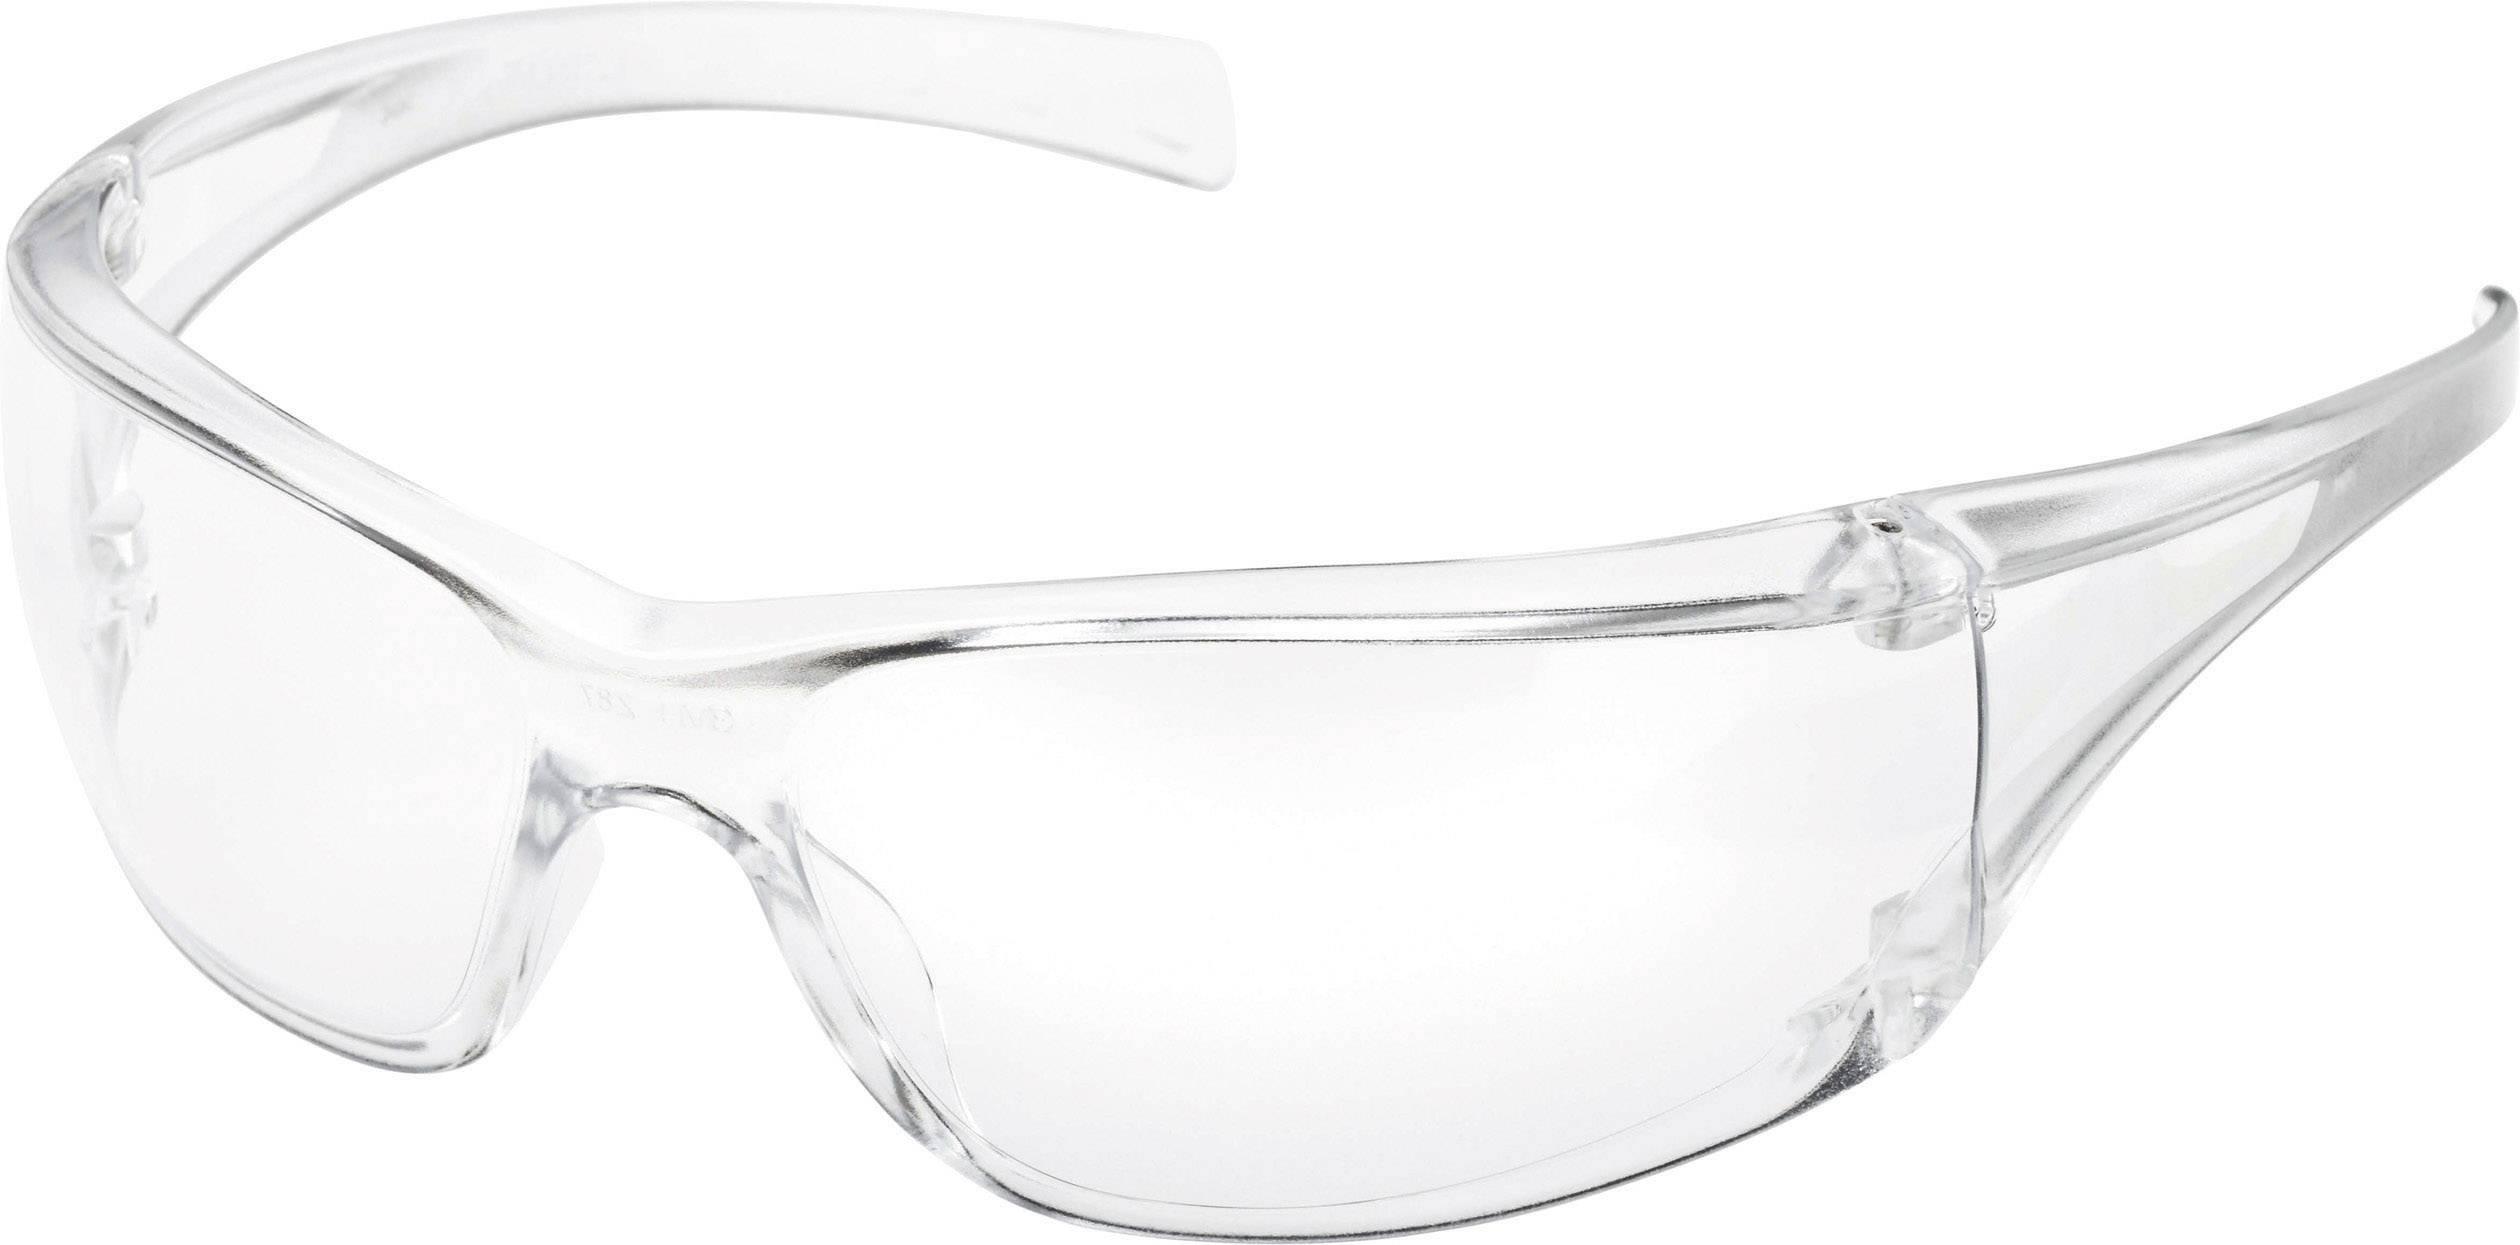 Ochranné brýle 3M Virtua, VIRTUA0, transparentní